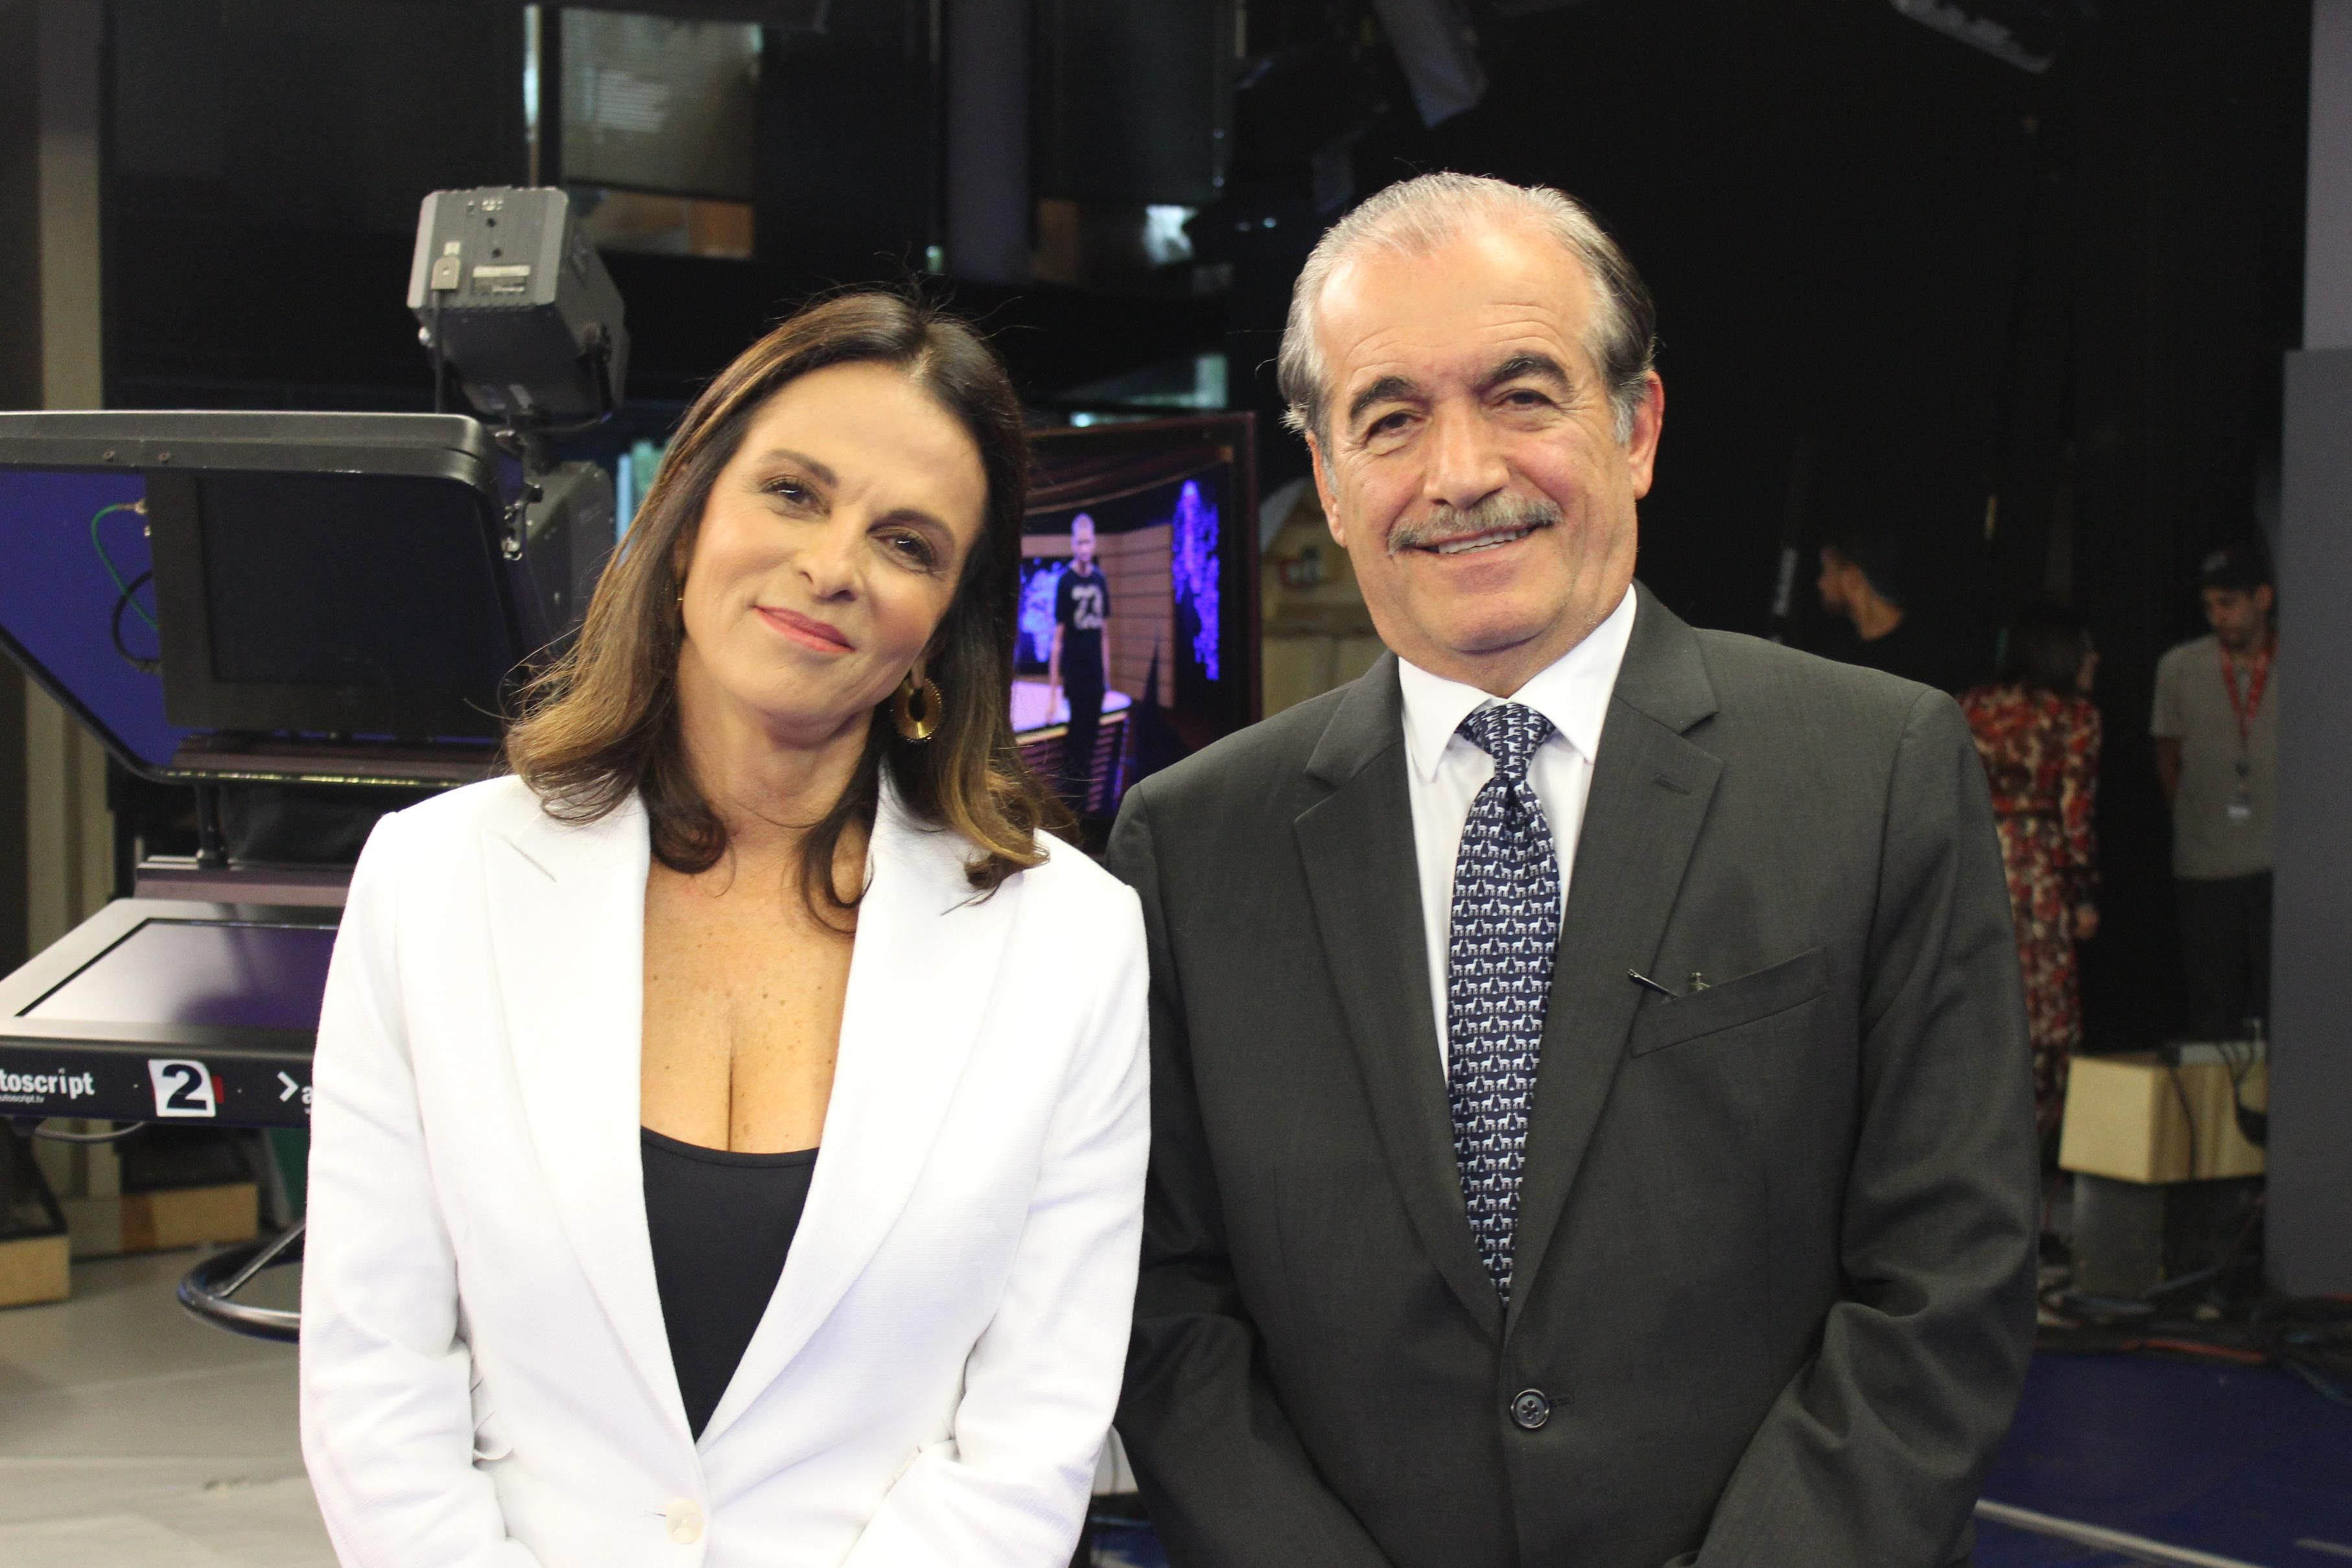 Sonia entrevista Chaim Zaher